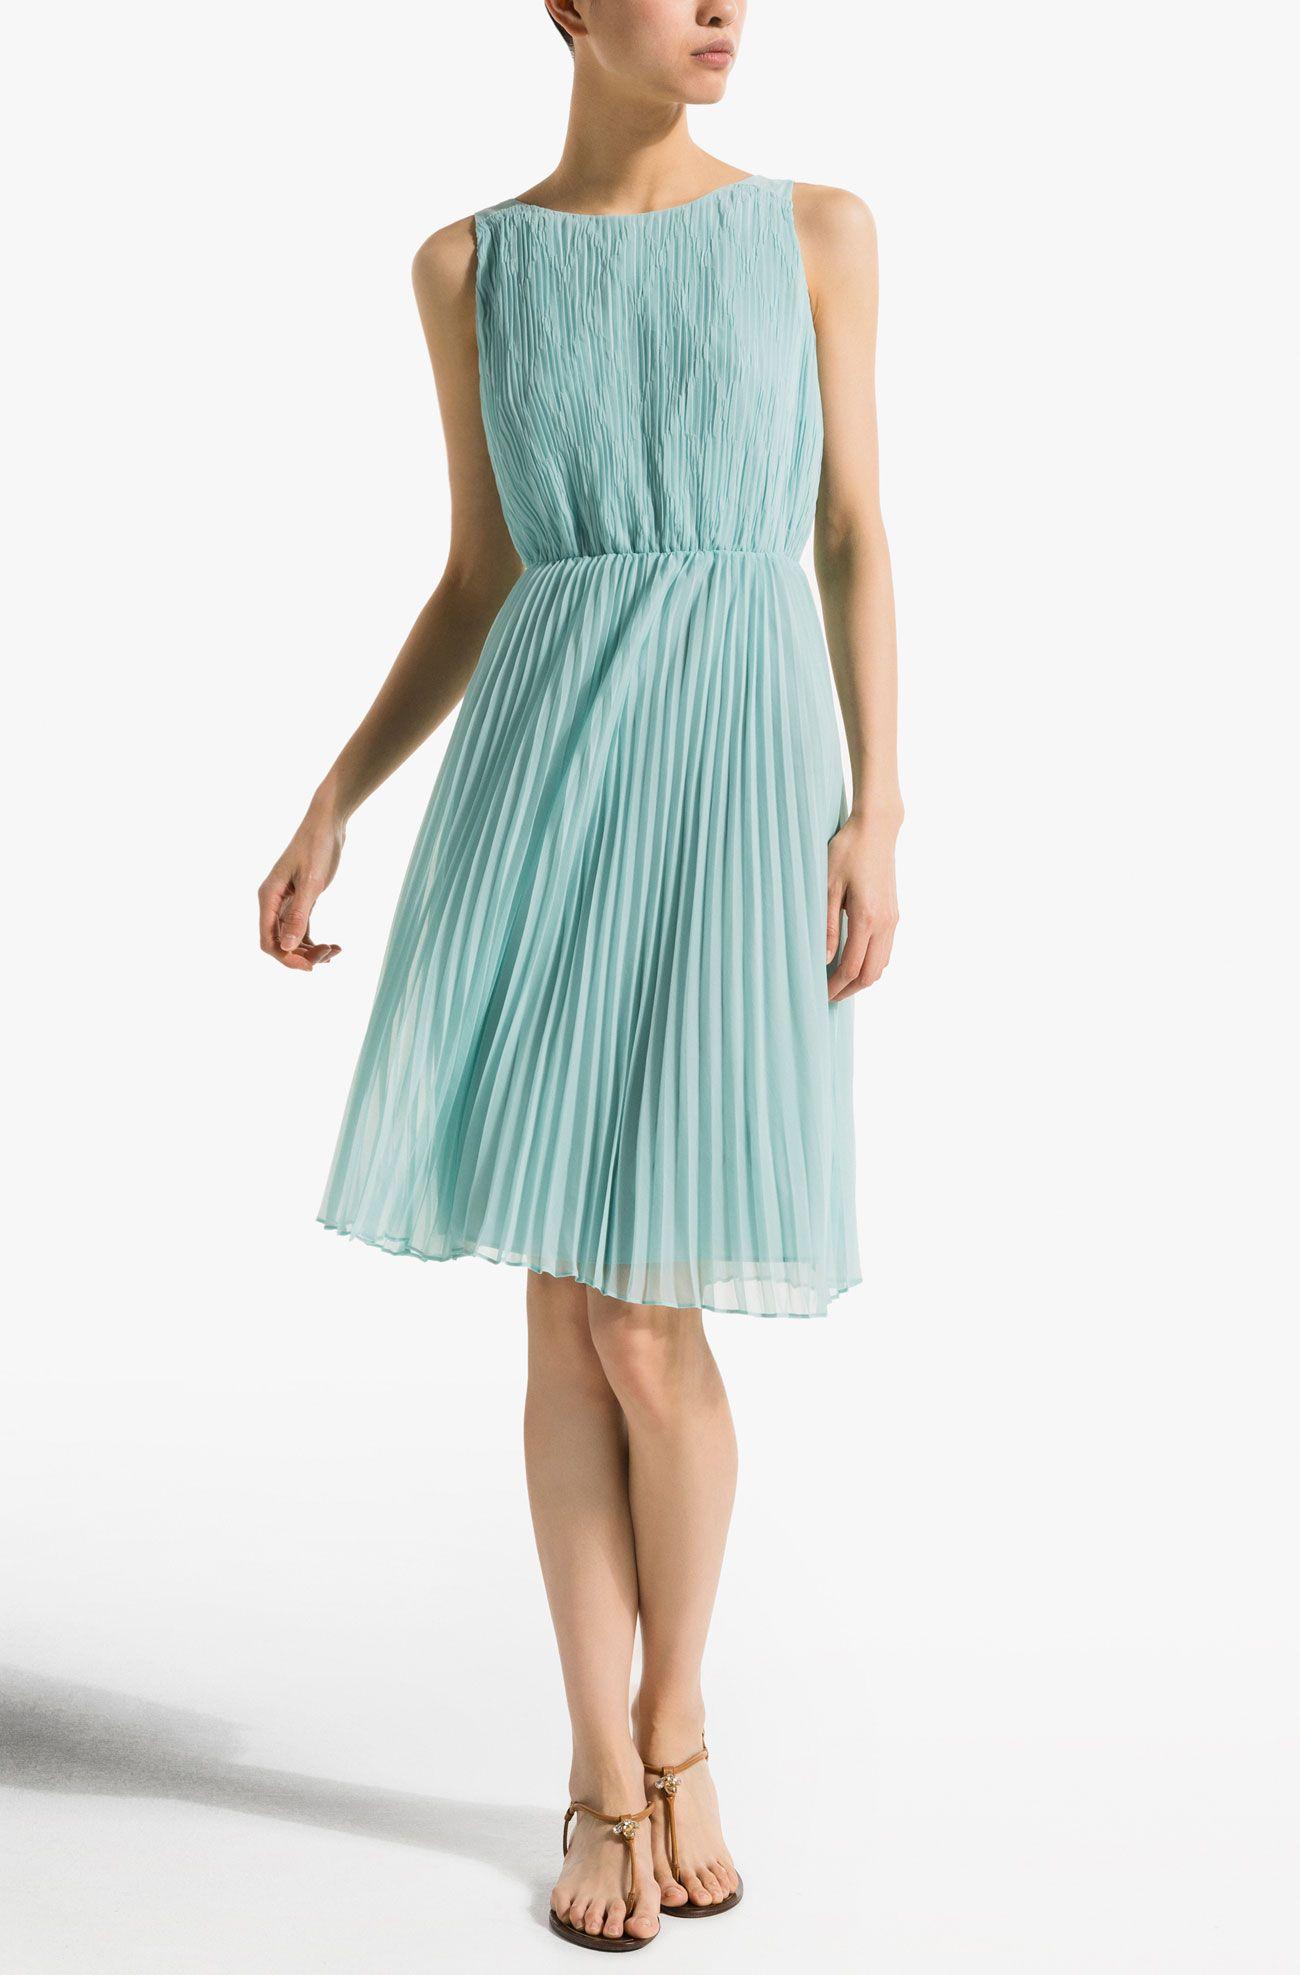 Massimo Duti 69,95€ #fashion #lowcost #dresses #moda http ...